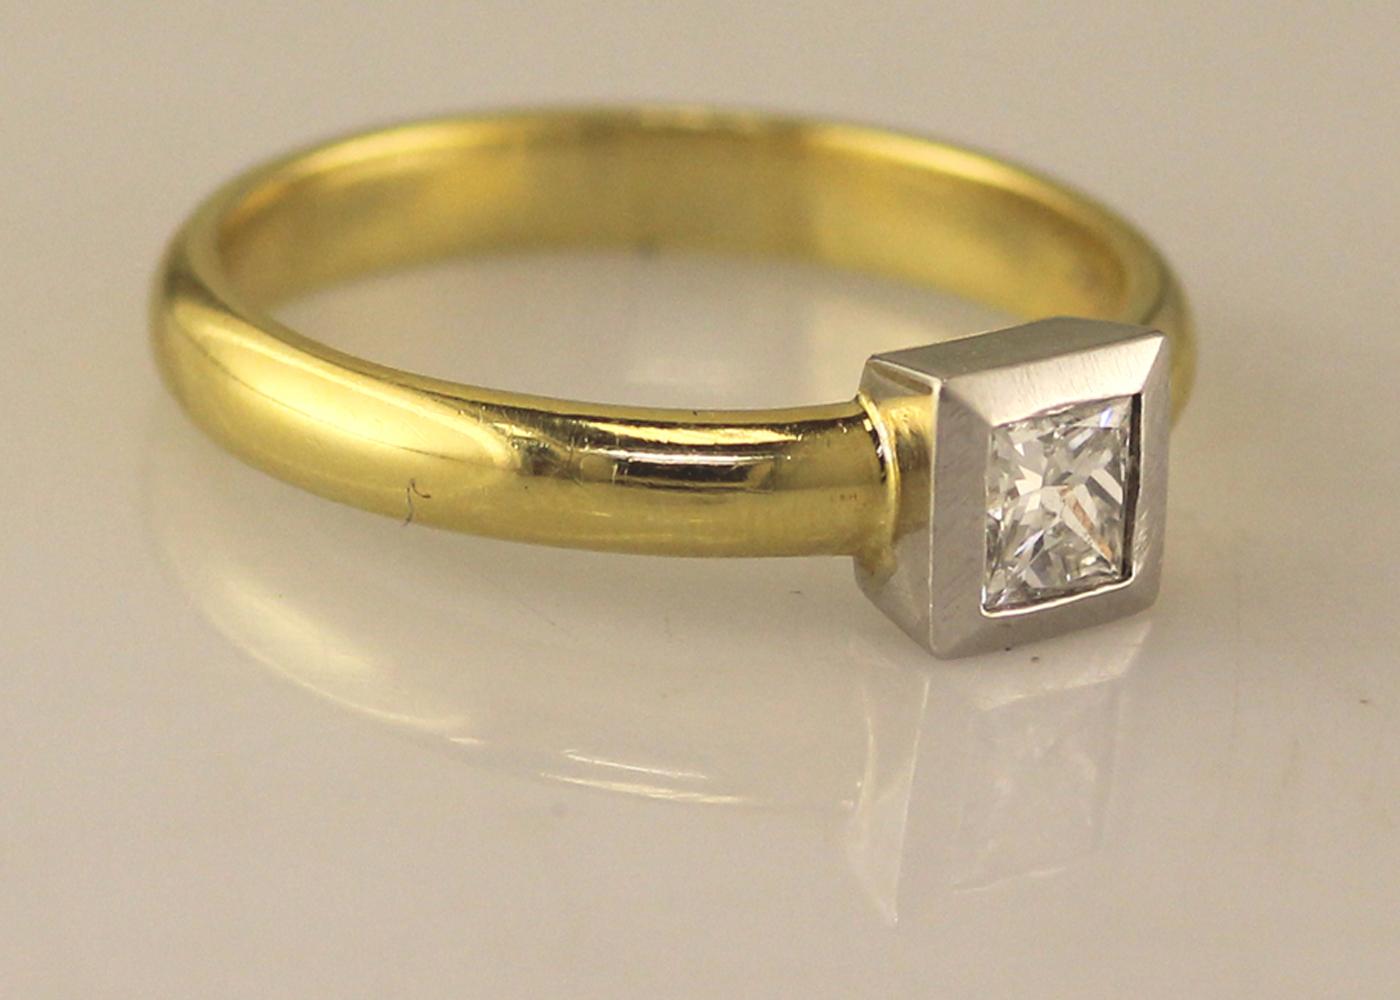 18ct Princess Cut Rub Over Diamond Ring 0.45 Carats - Image 8 of 8